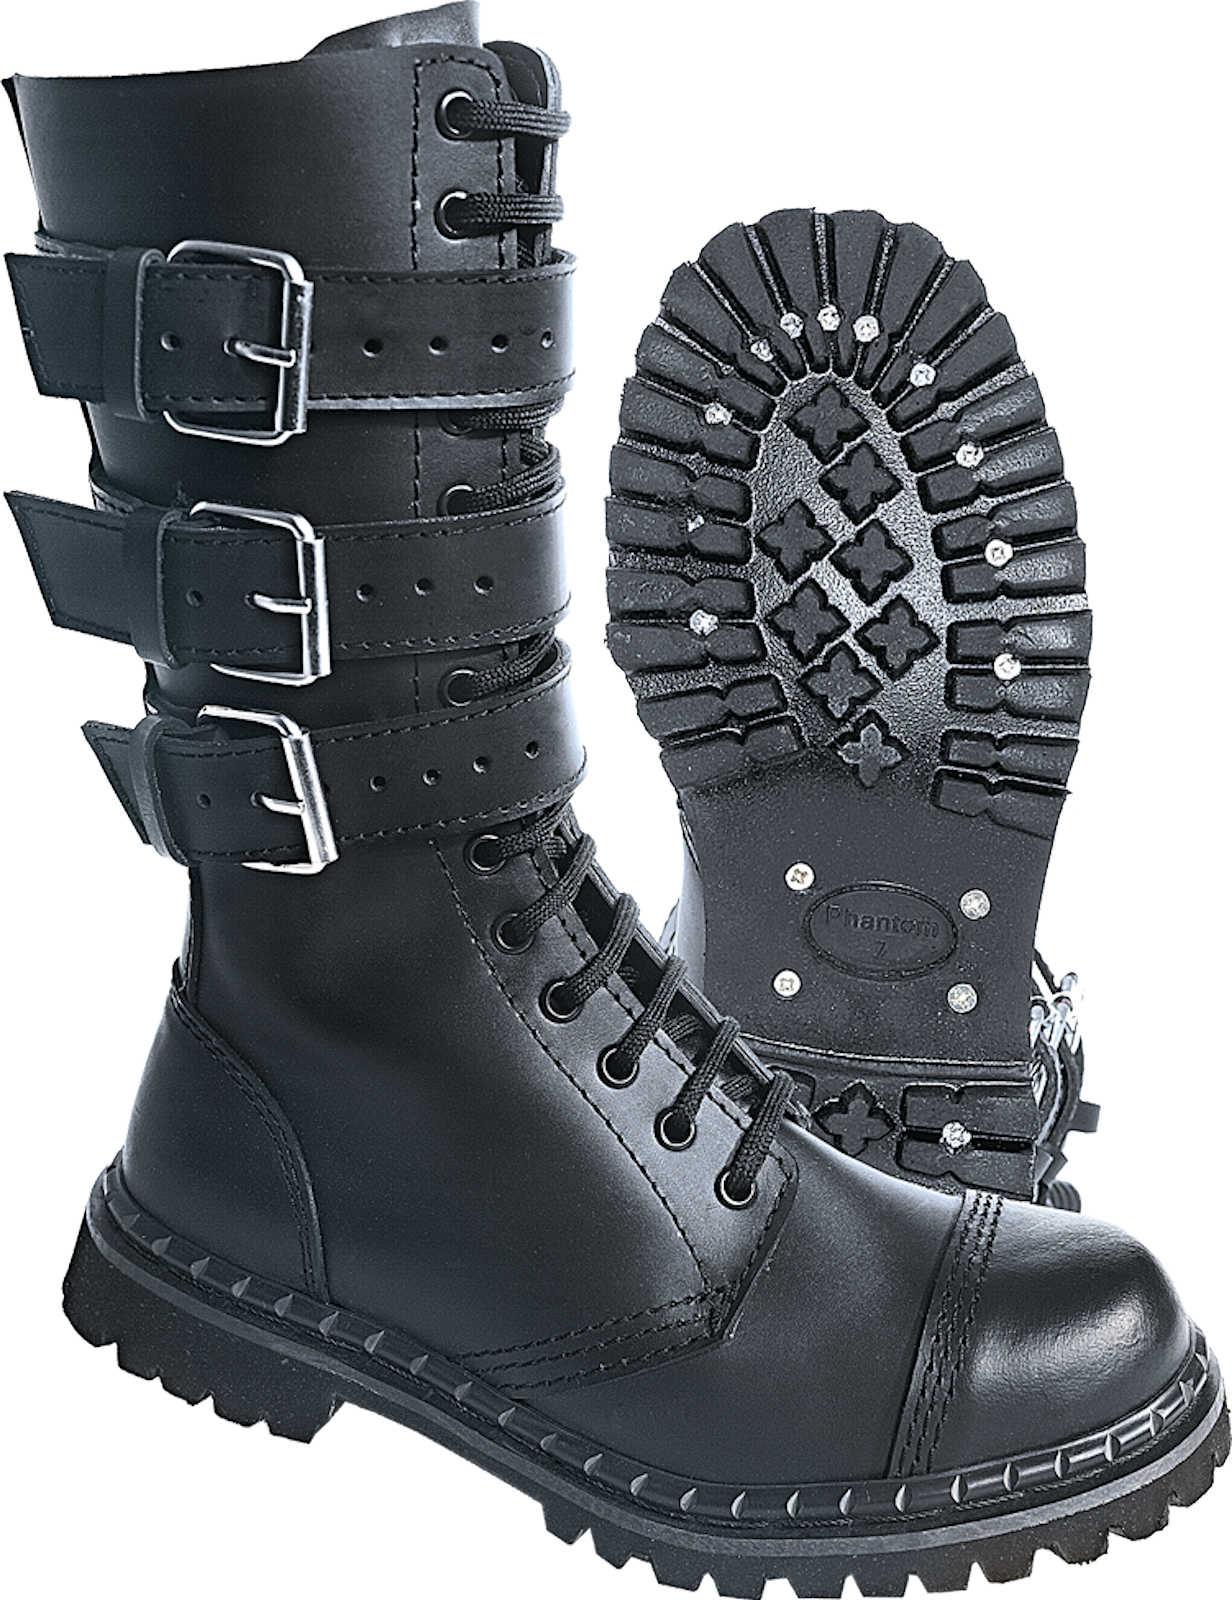 Brandit Phantom botas Buckle 9005 9005 9005 Gothic Stiefel Rangers Army Springerstiefel b647b7